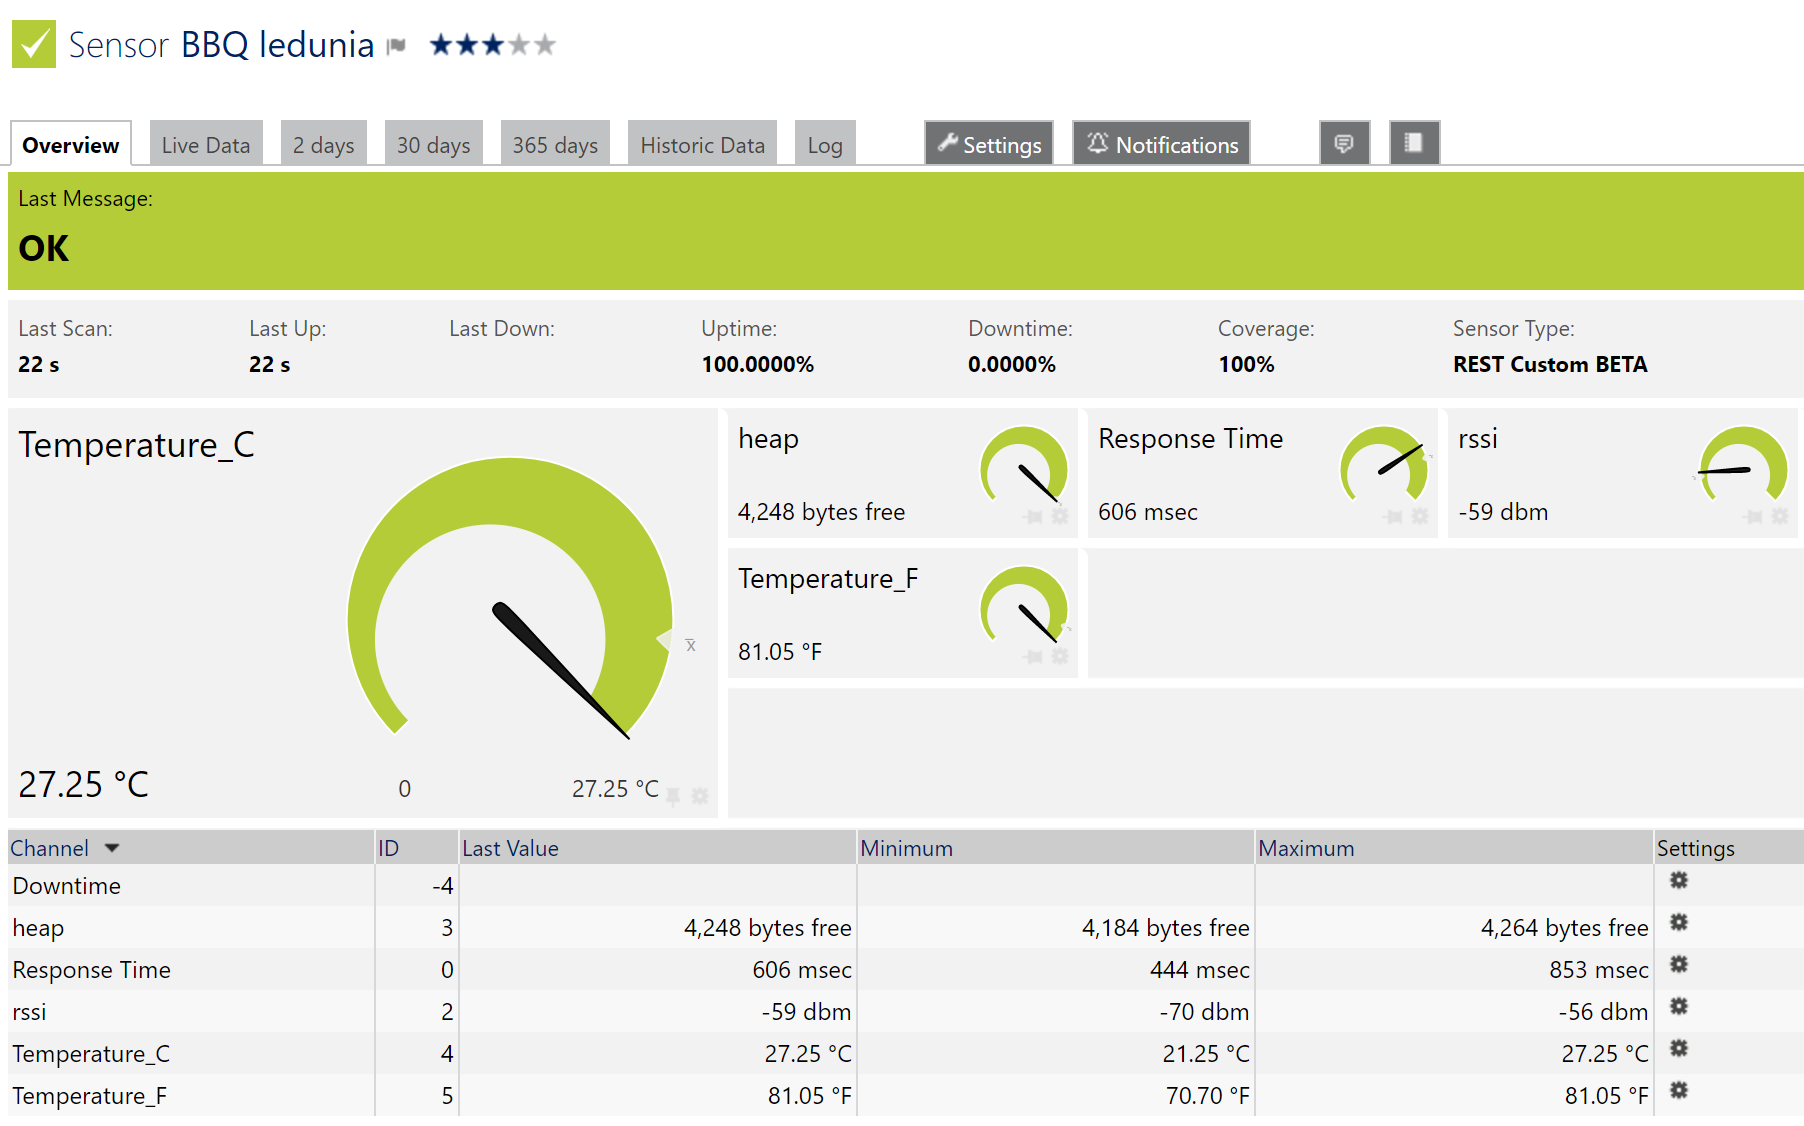 BBQ ledunia   Sensor Details   PRTG Network Monitor  WIN FMV9GQ089DS1.png